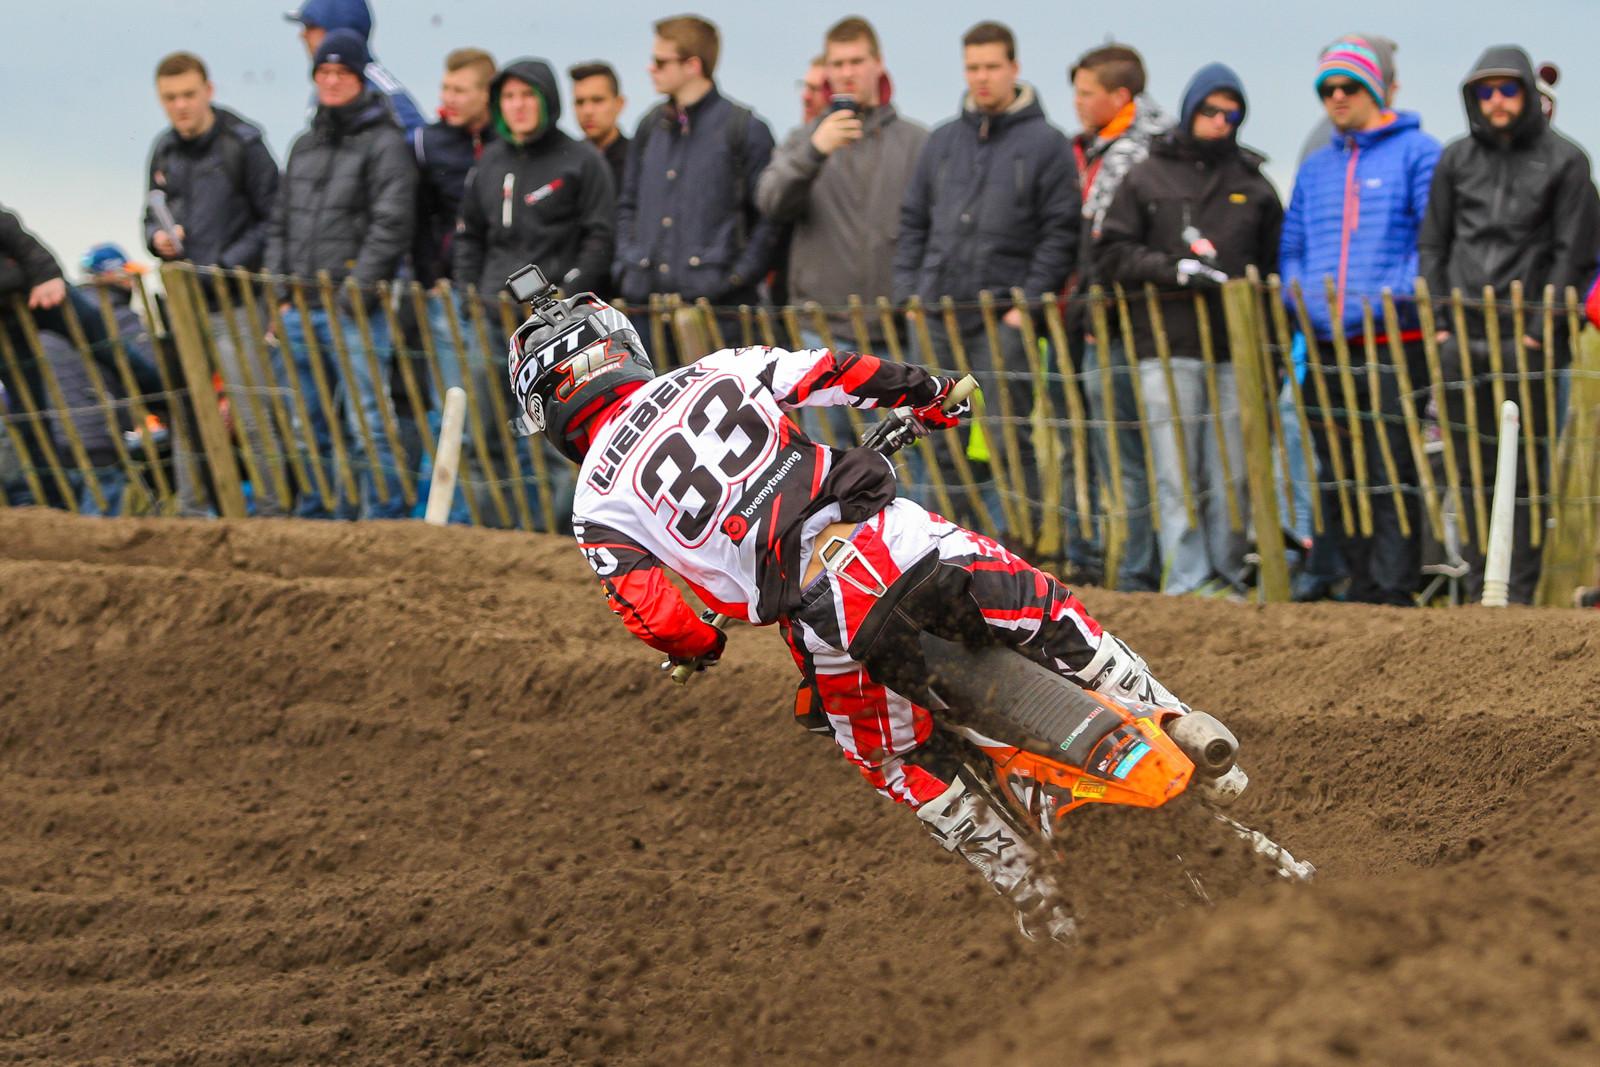 Julien Lieber - Photo Blast: 2017 MXGP of Valkenswaard - Motocross Pictures - Vital MX